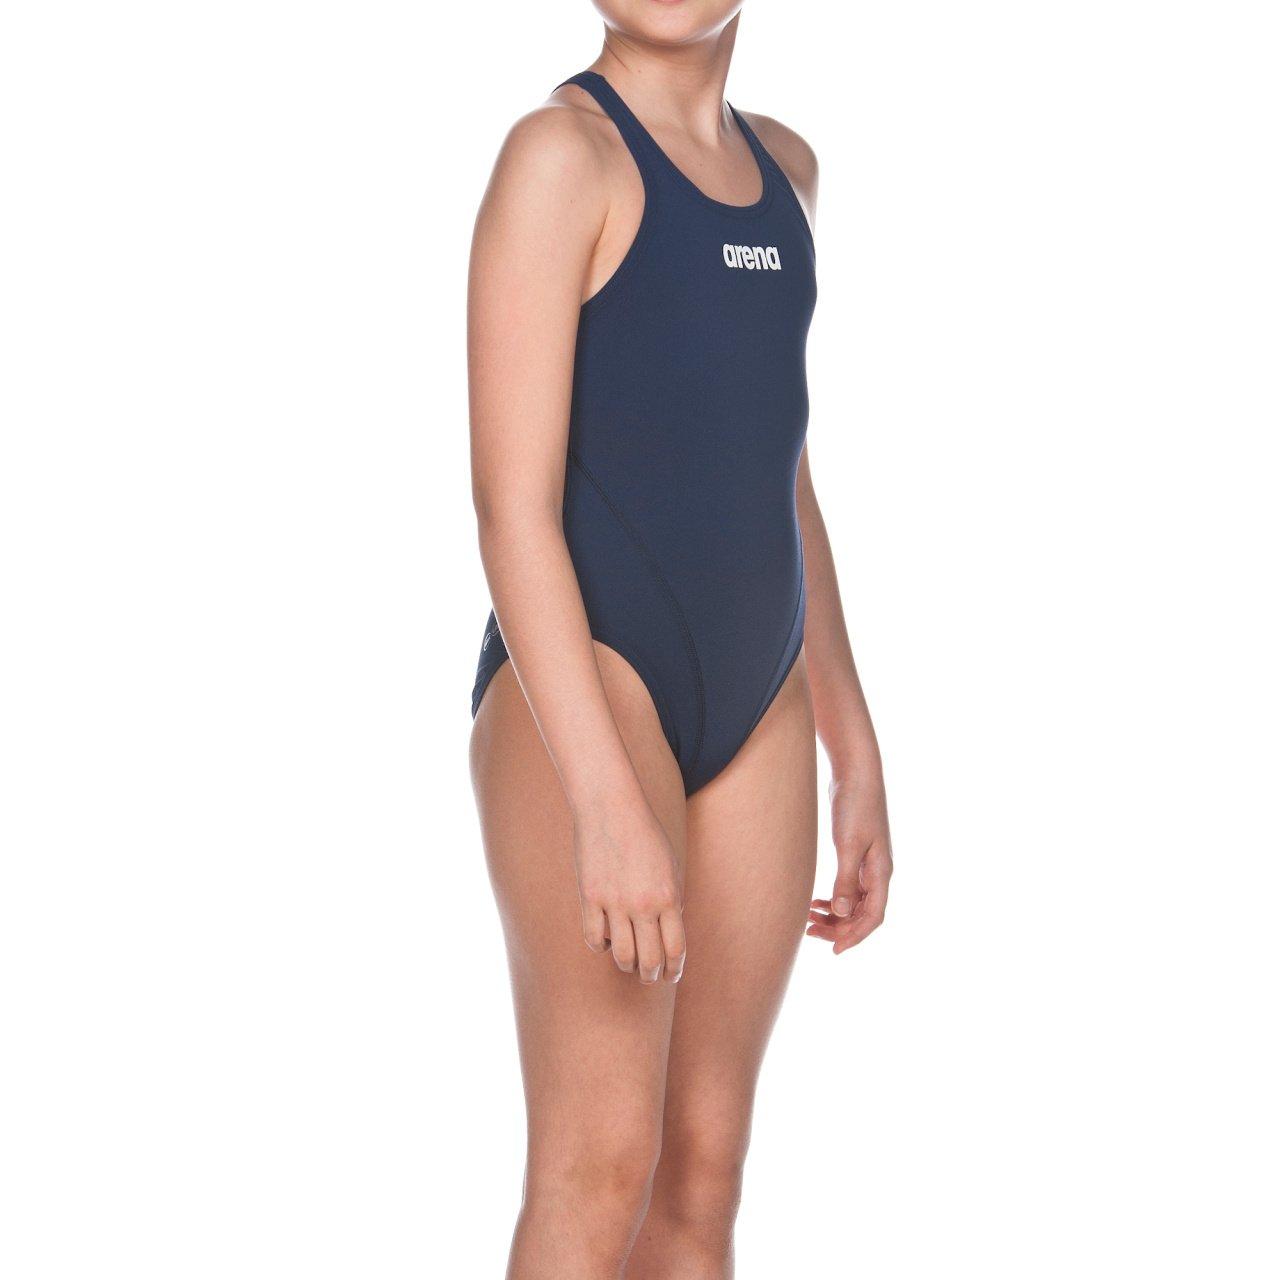 c52515e8b249 Arena Solid Swim Tech Jr Costume da Bagno, Bambina [1540906248 ...